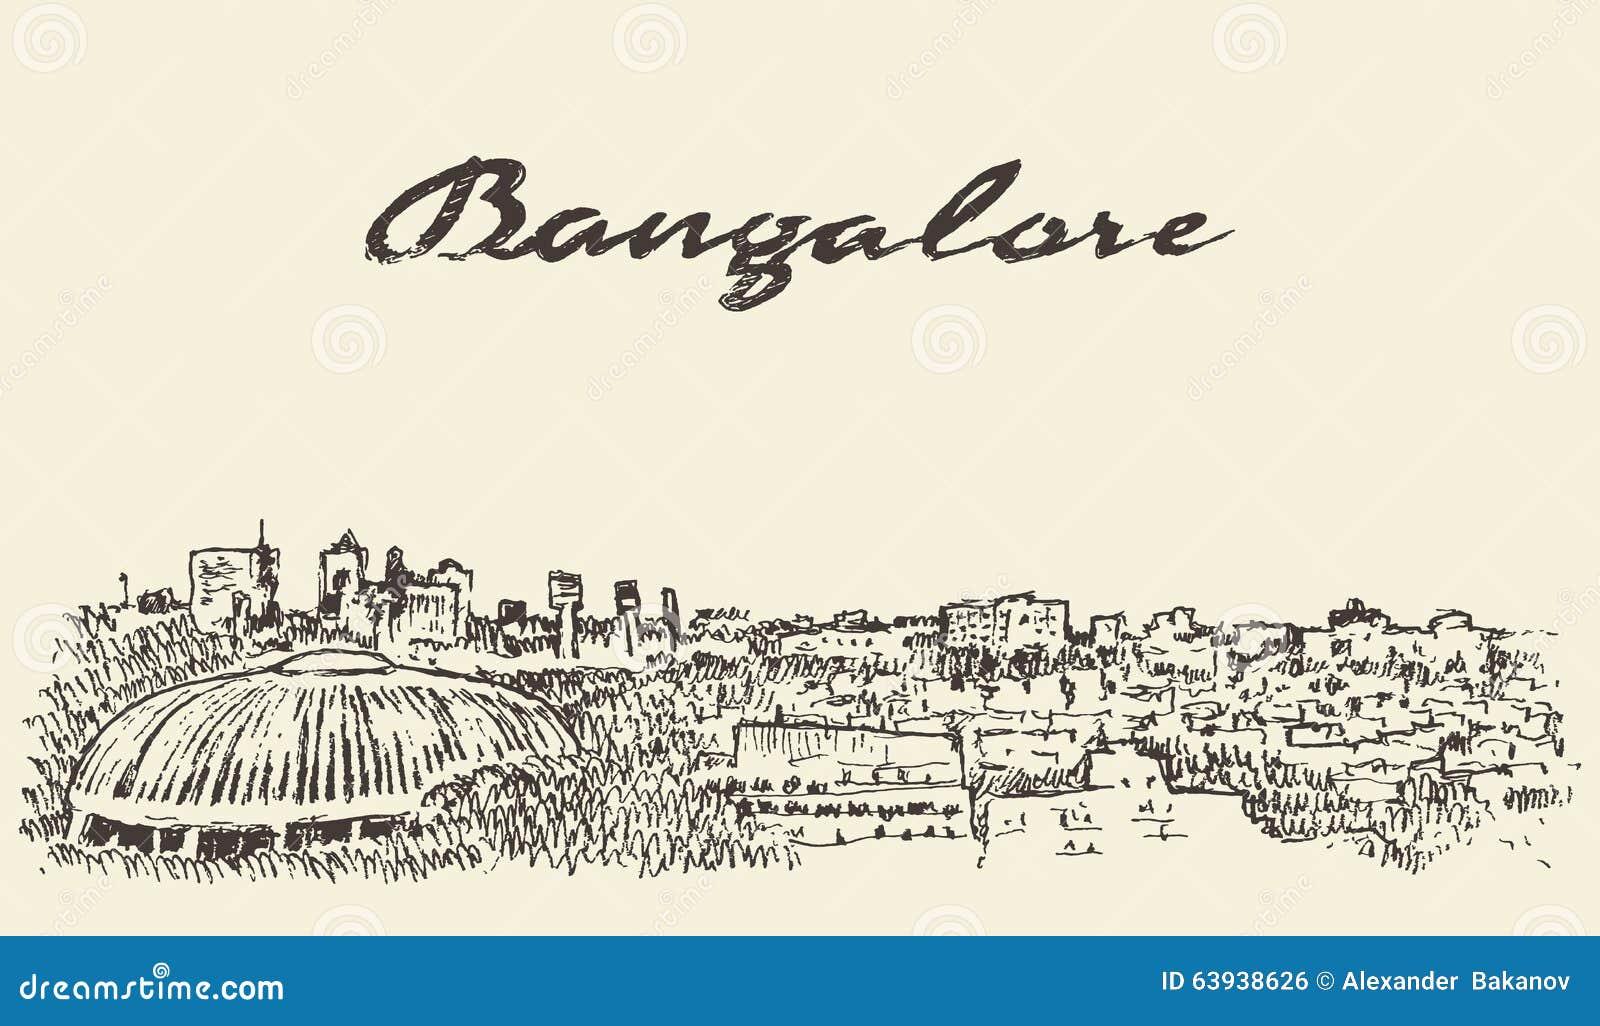 Free online dating bangalore